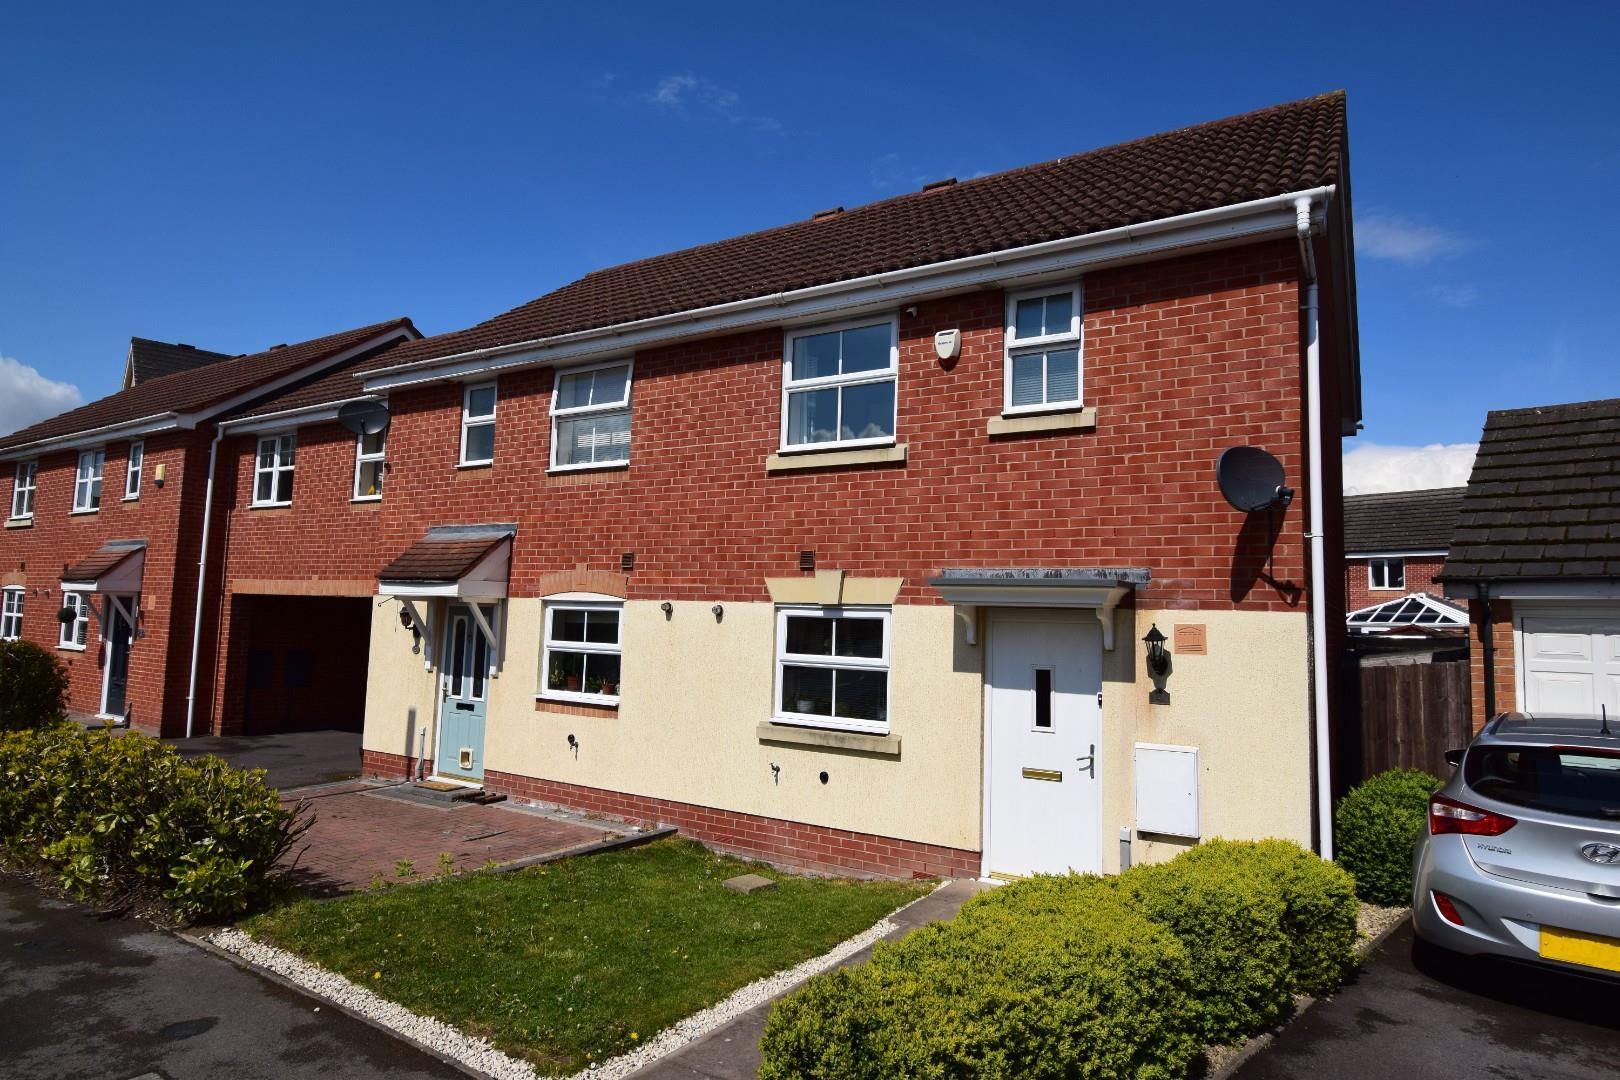 4 Garrington Road, Breme Park, Bromsgrove, Worcestershire, B60 3GF